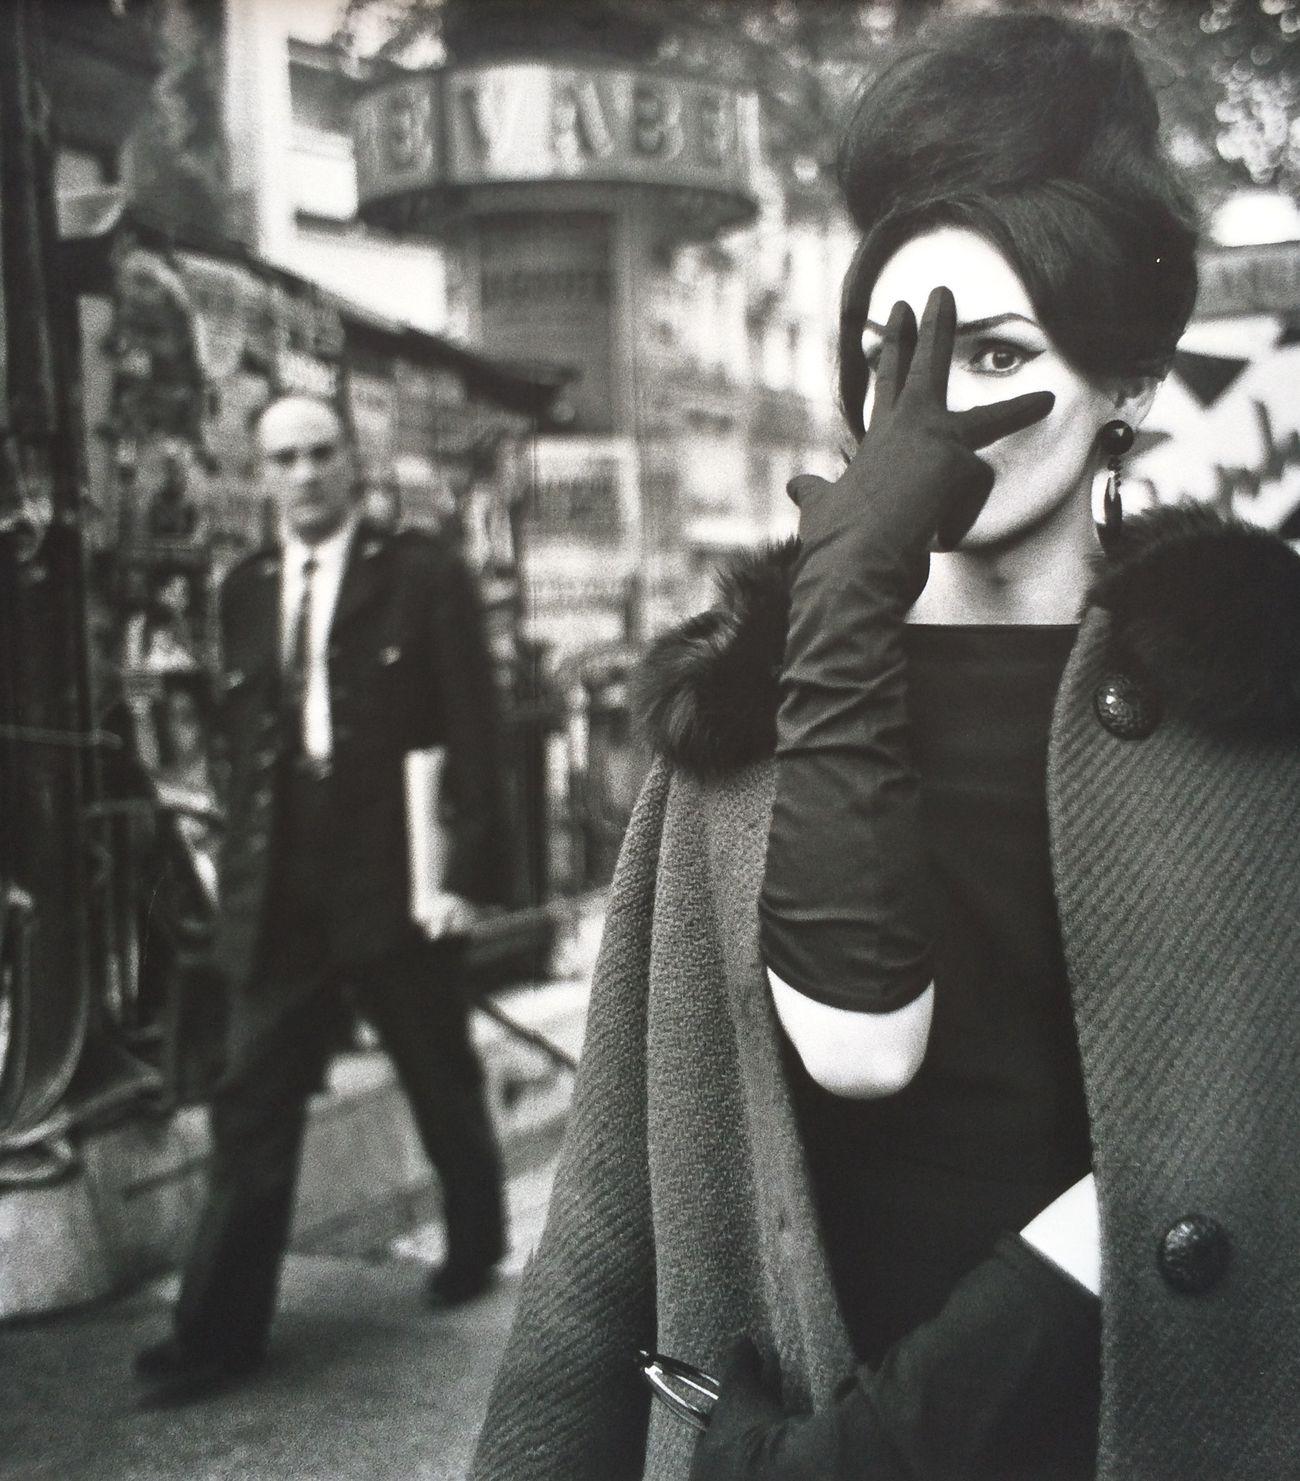 Dreaming Fashion&love&beauty Portrait Fashion Blackandwhite Street Fashion Black And White Streetphoto_bw